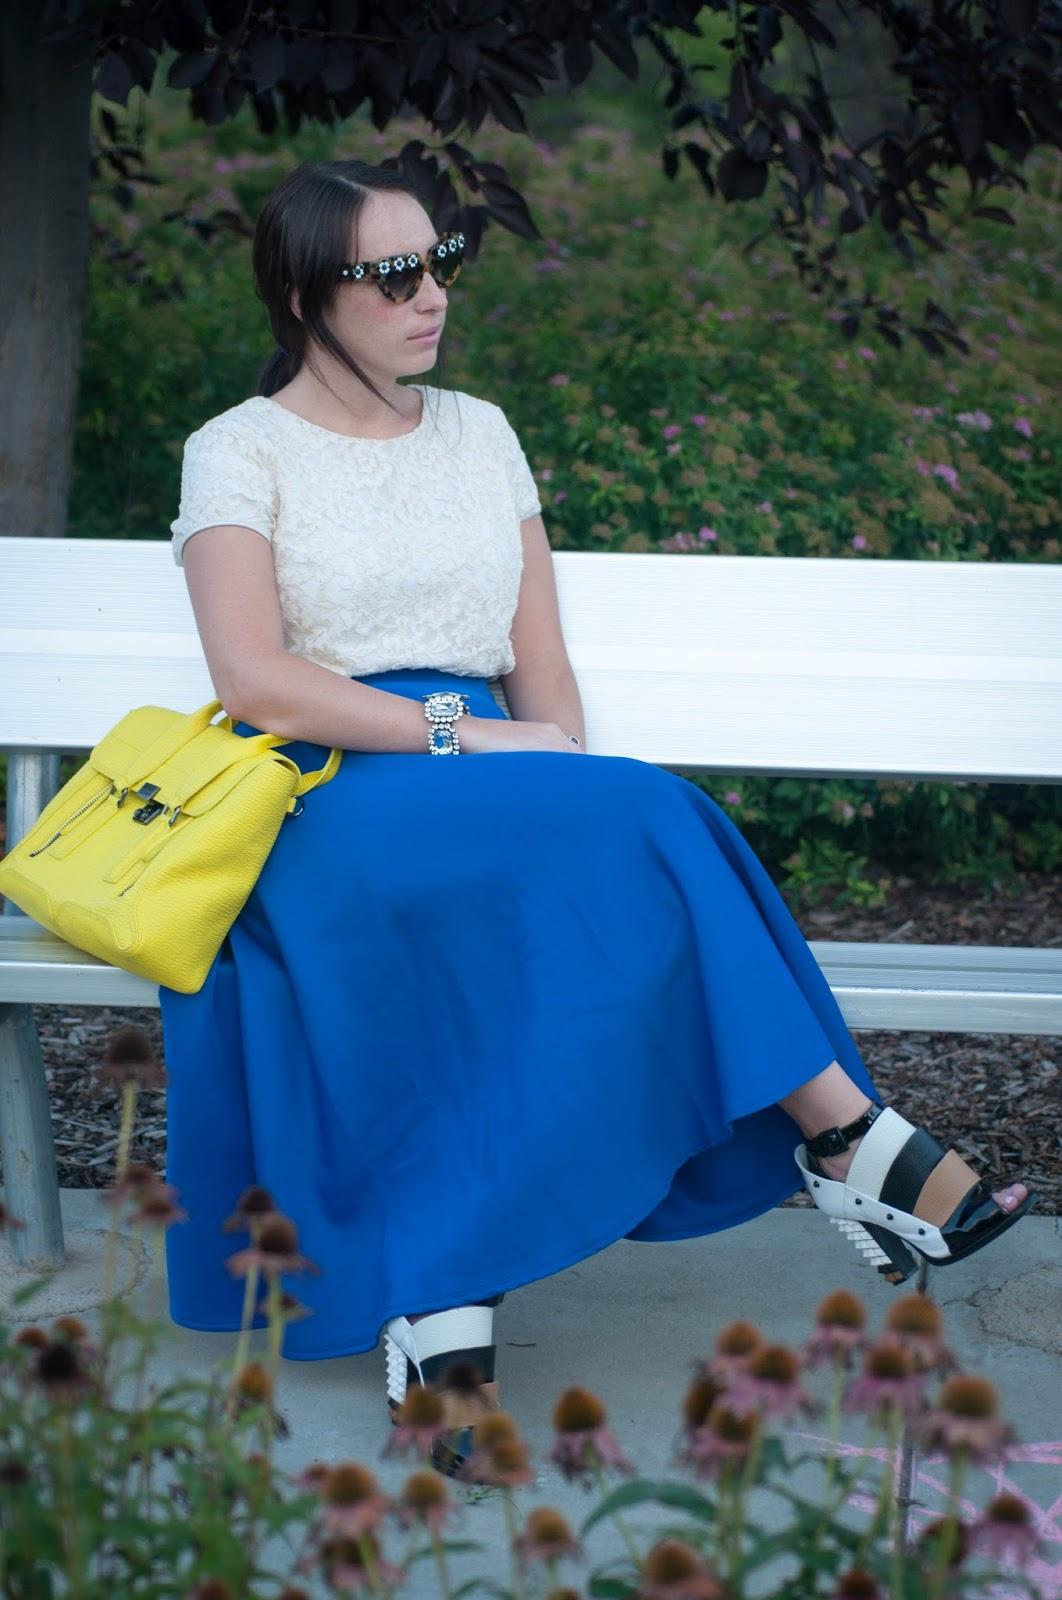 womens fashion, style blog, fashion blogger, ootd